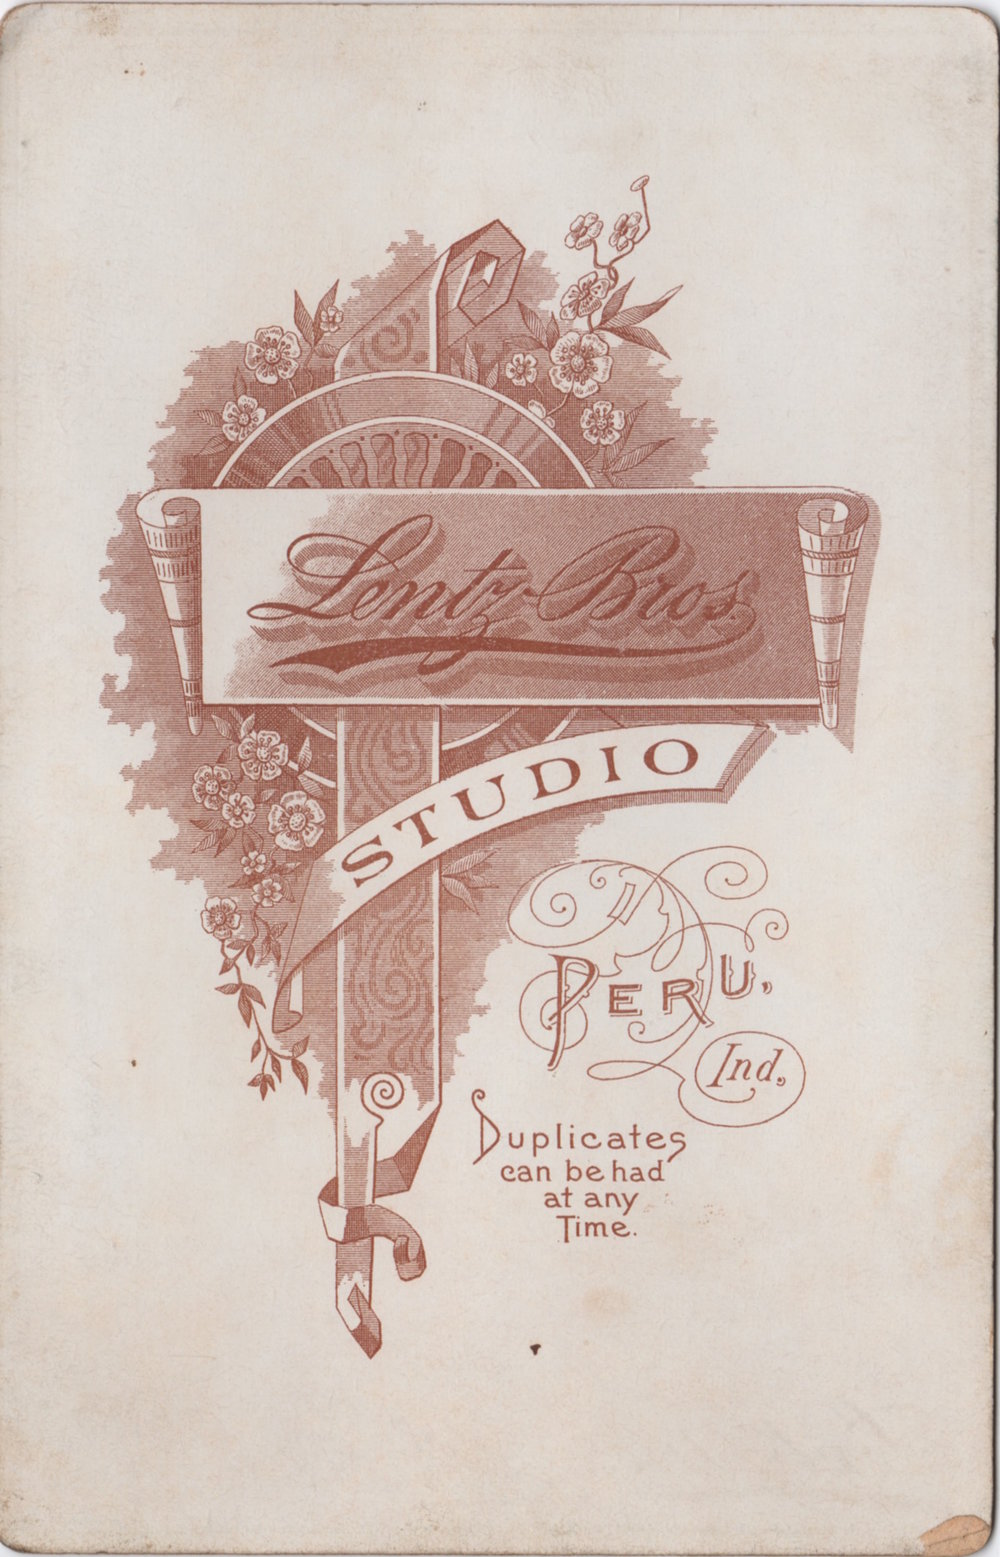 Lentz Bros. Studio - Peru, Indiana